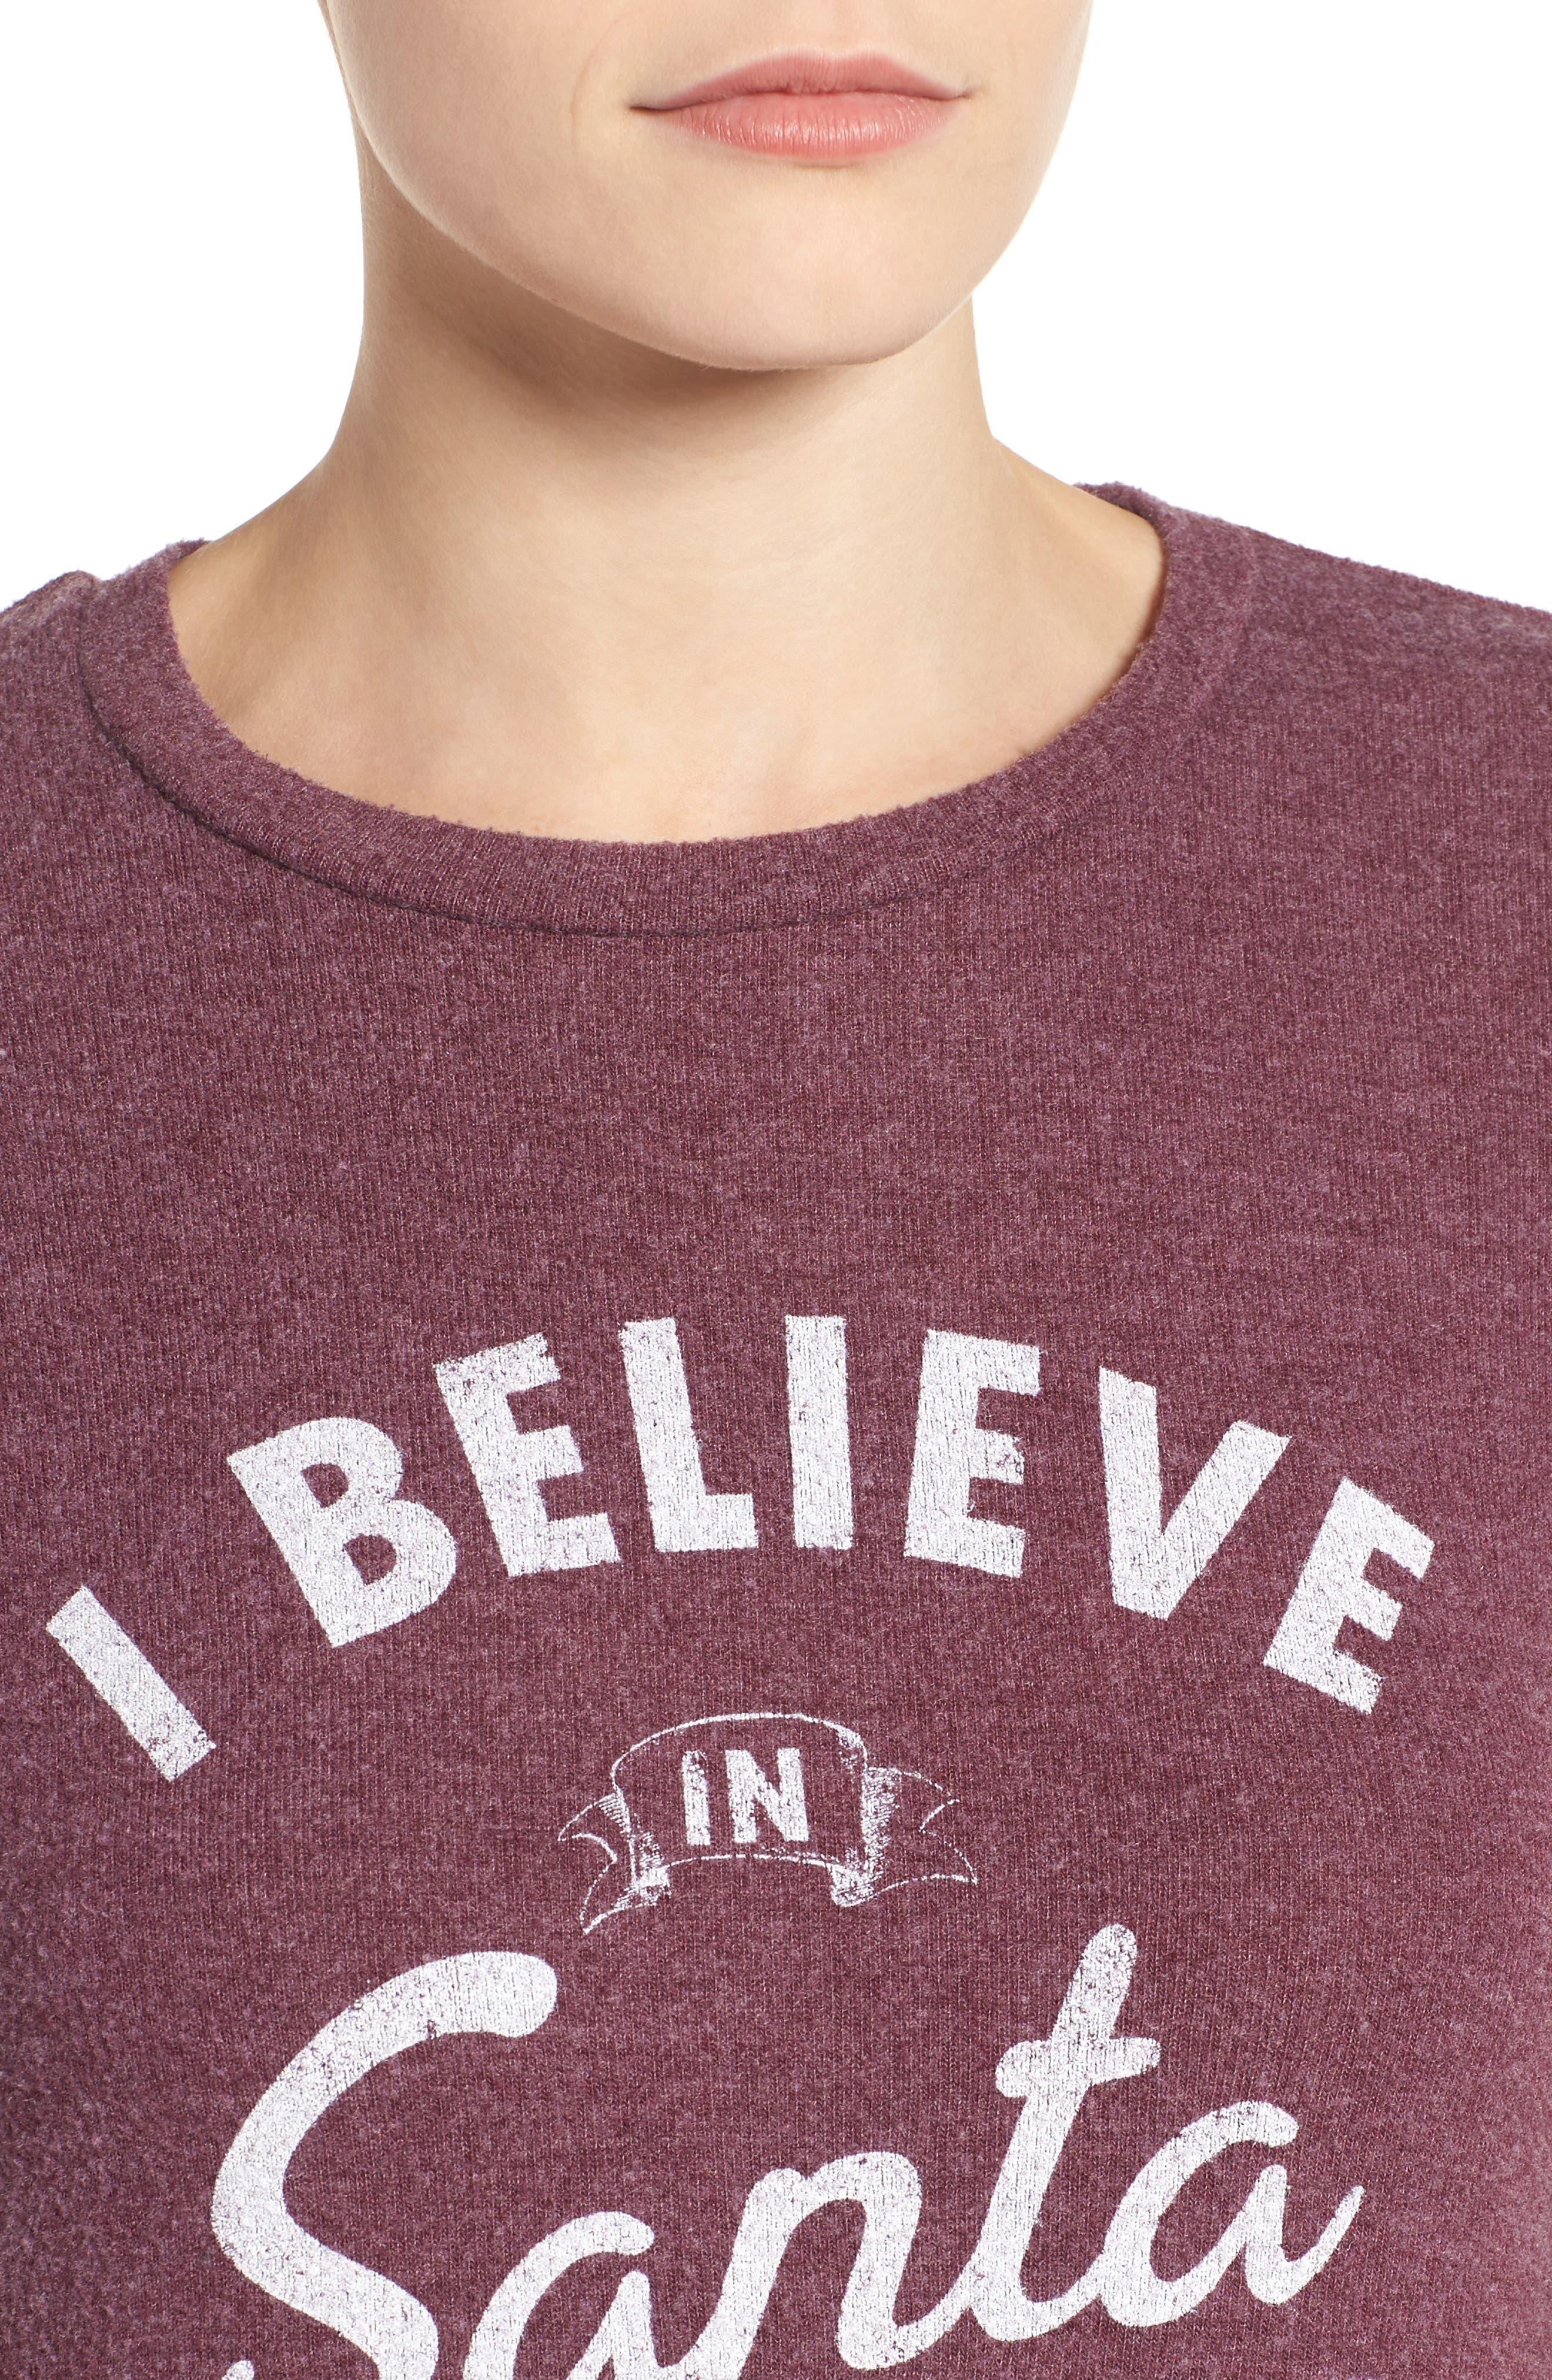 I Believe in Santa Sweatshirt,                             Alternate thumbnail 4, color,                             930